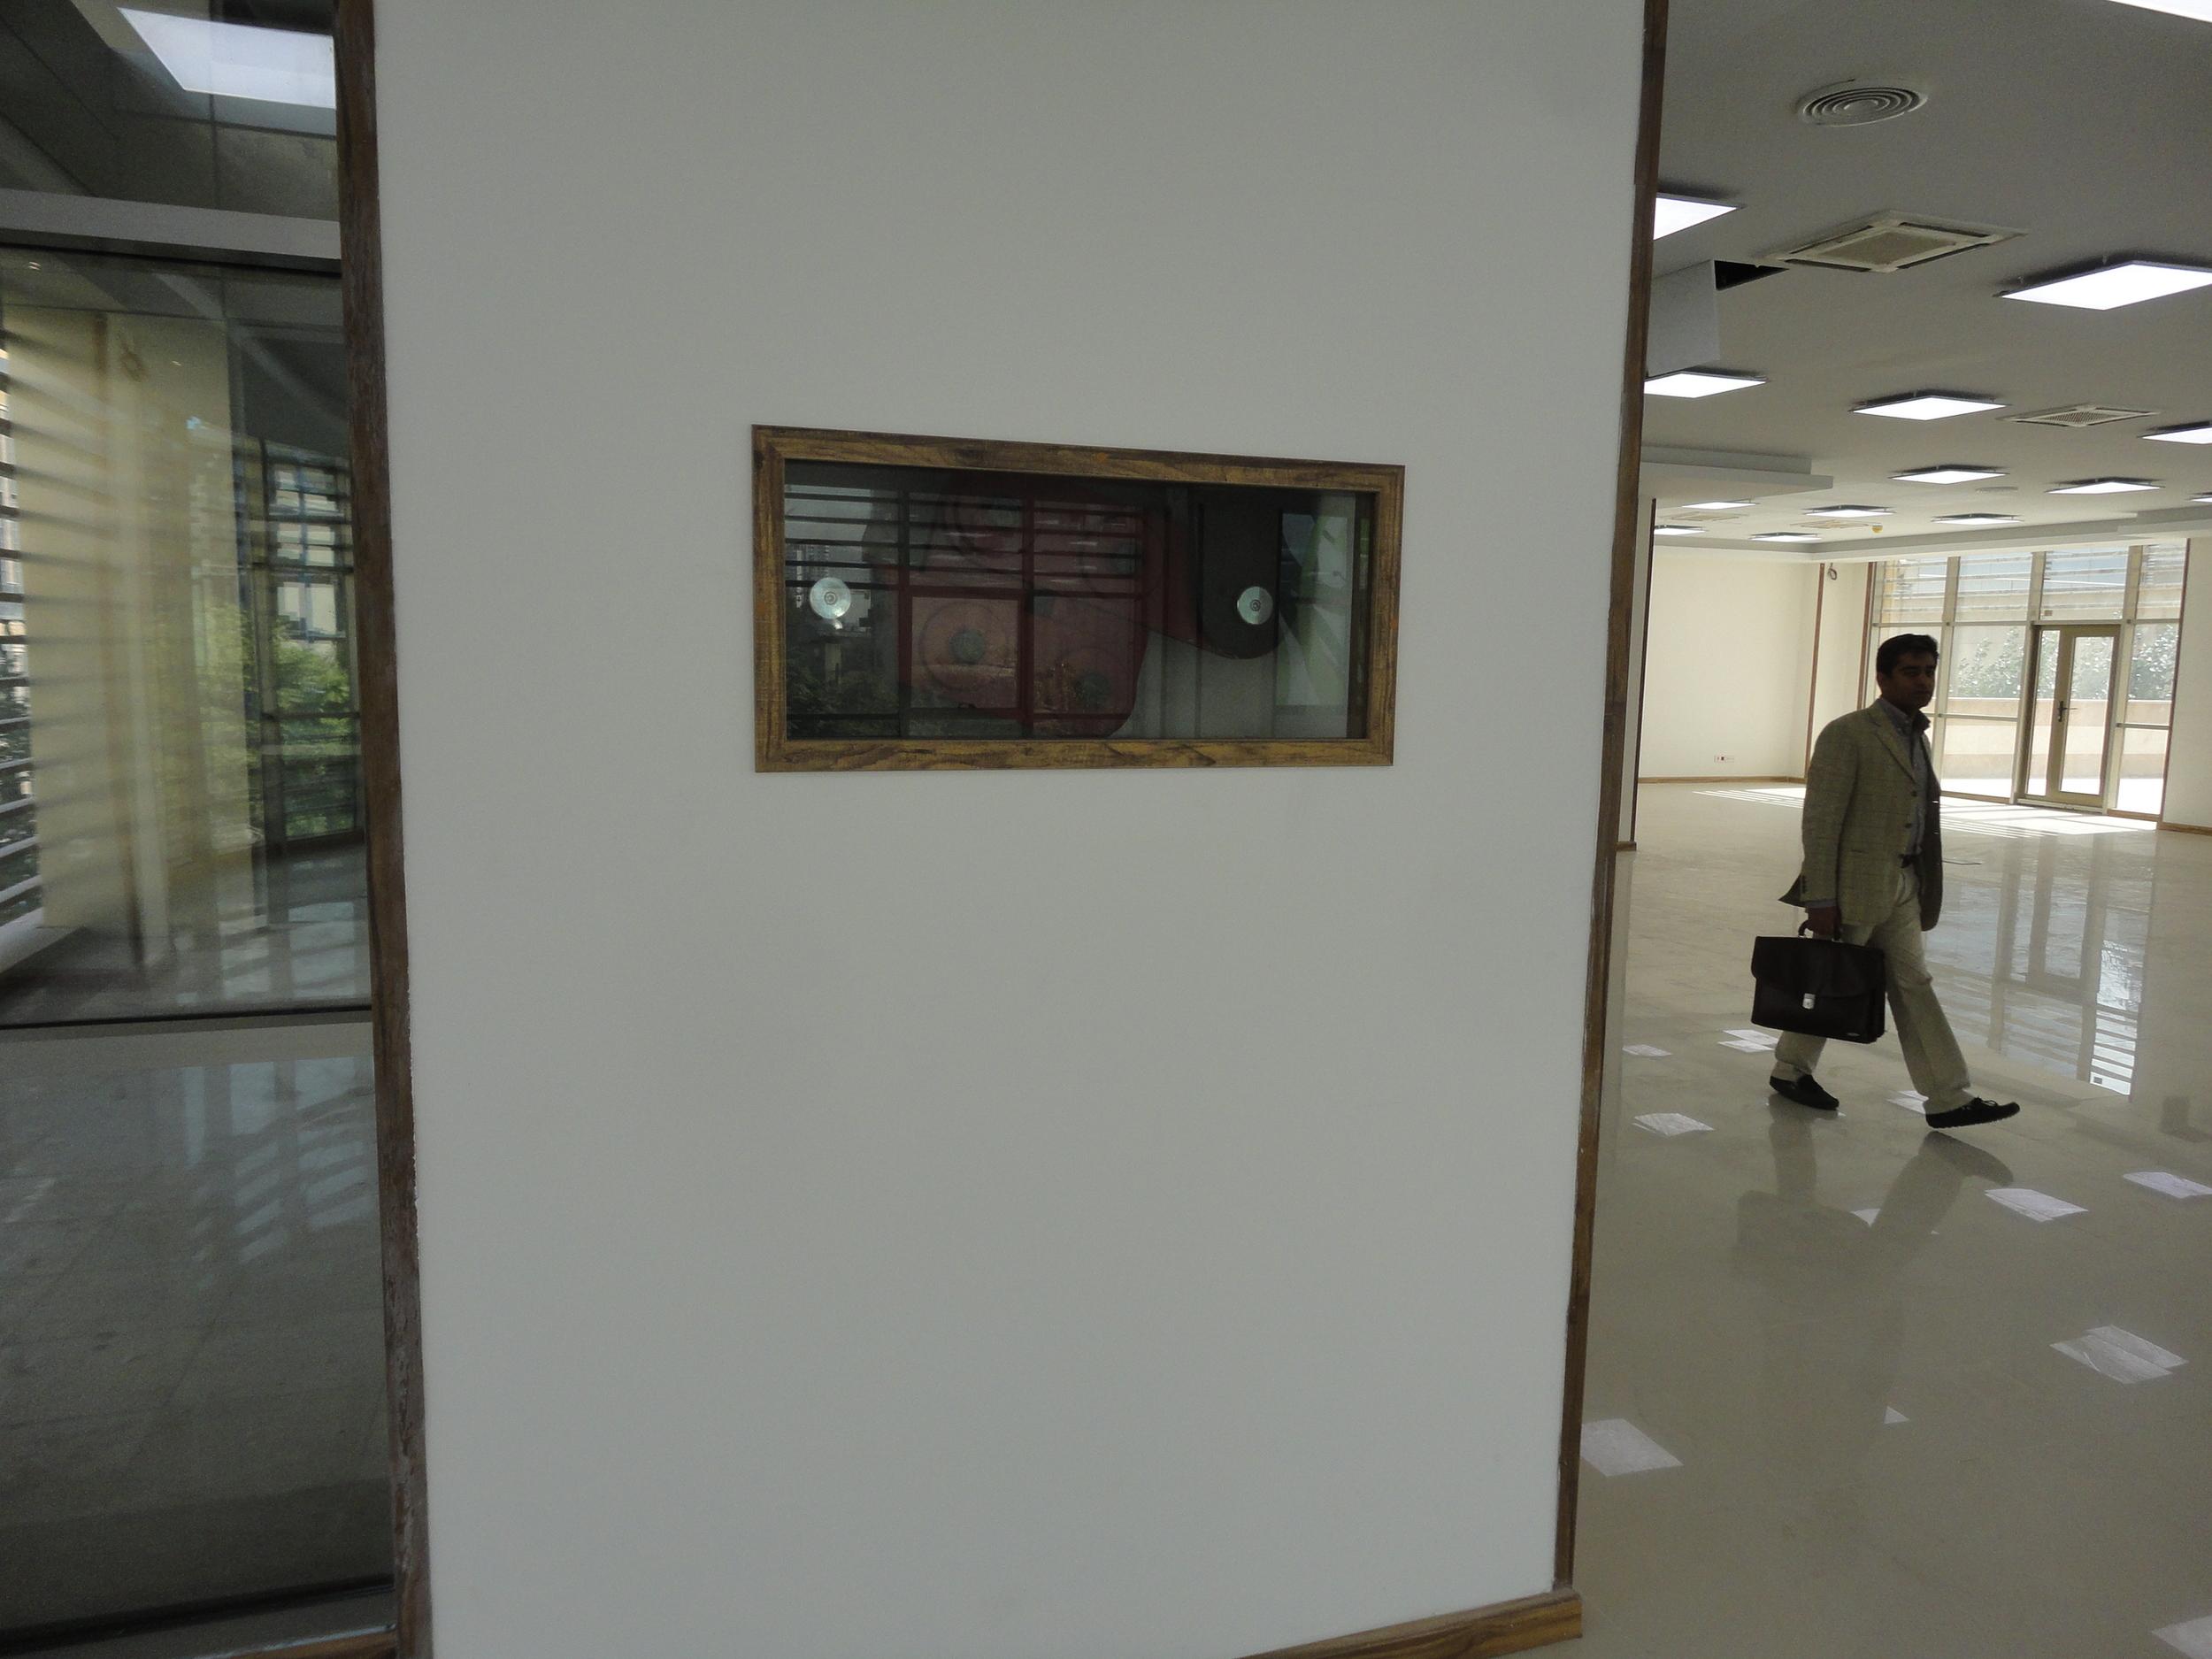 DSC03470.JPG